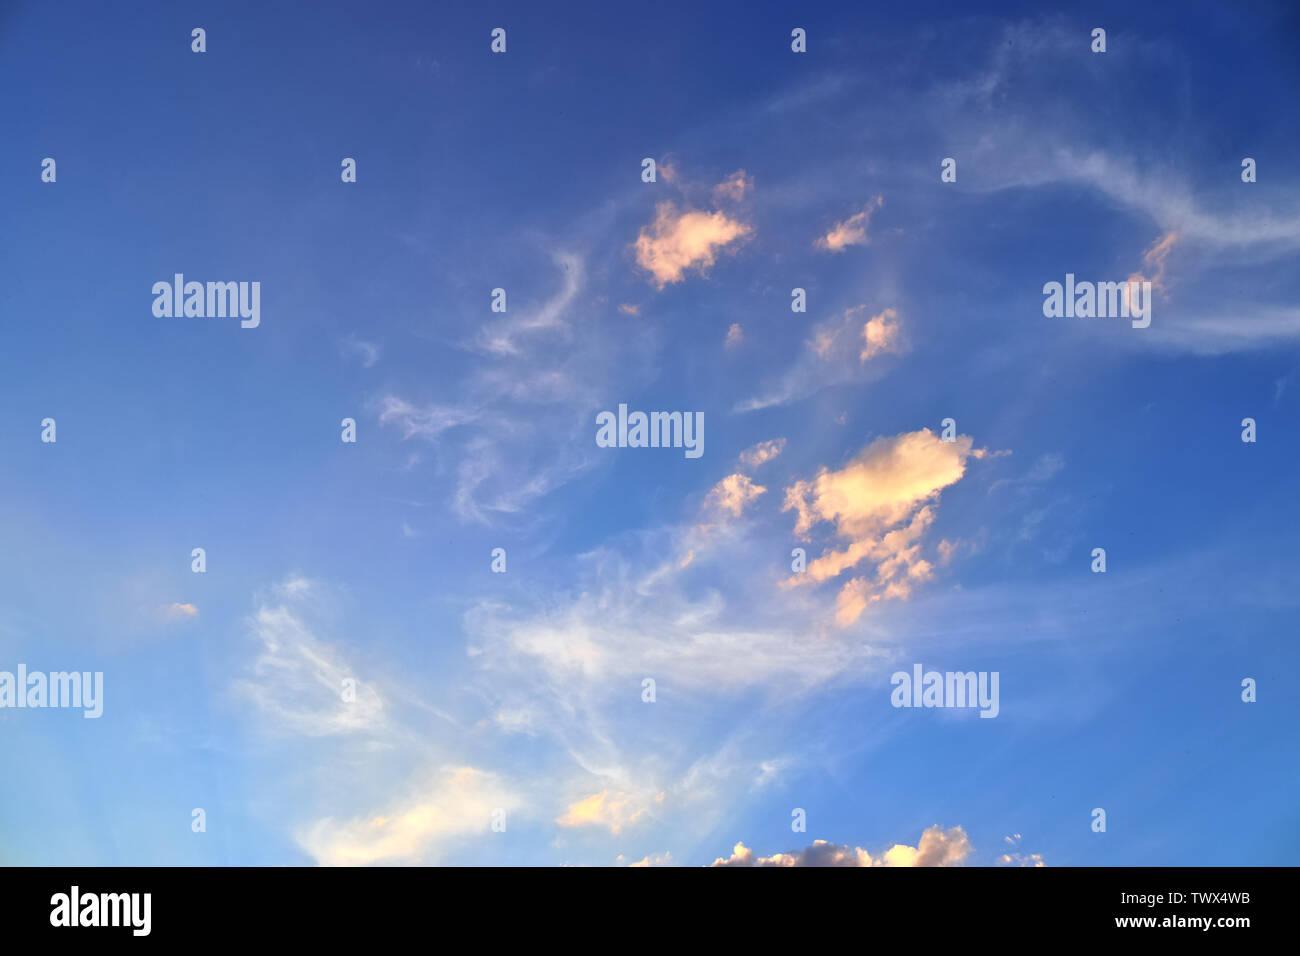 Beautiful orange sunset cloud formations with sunlight shining through - Stock Image